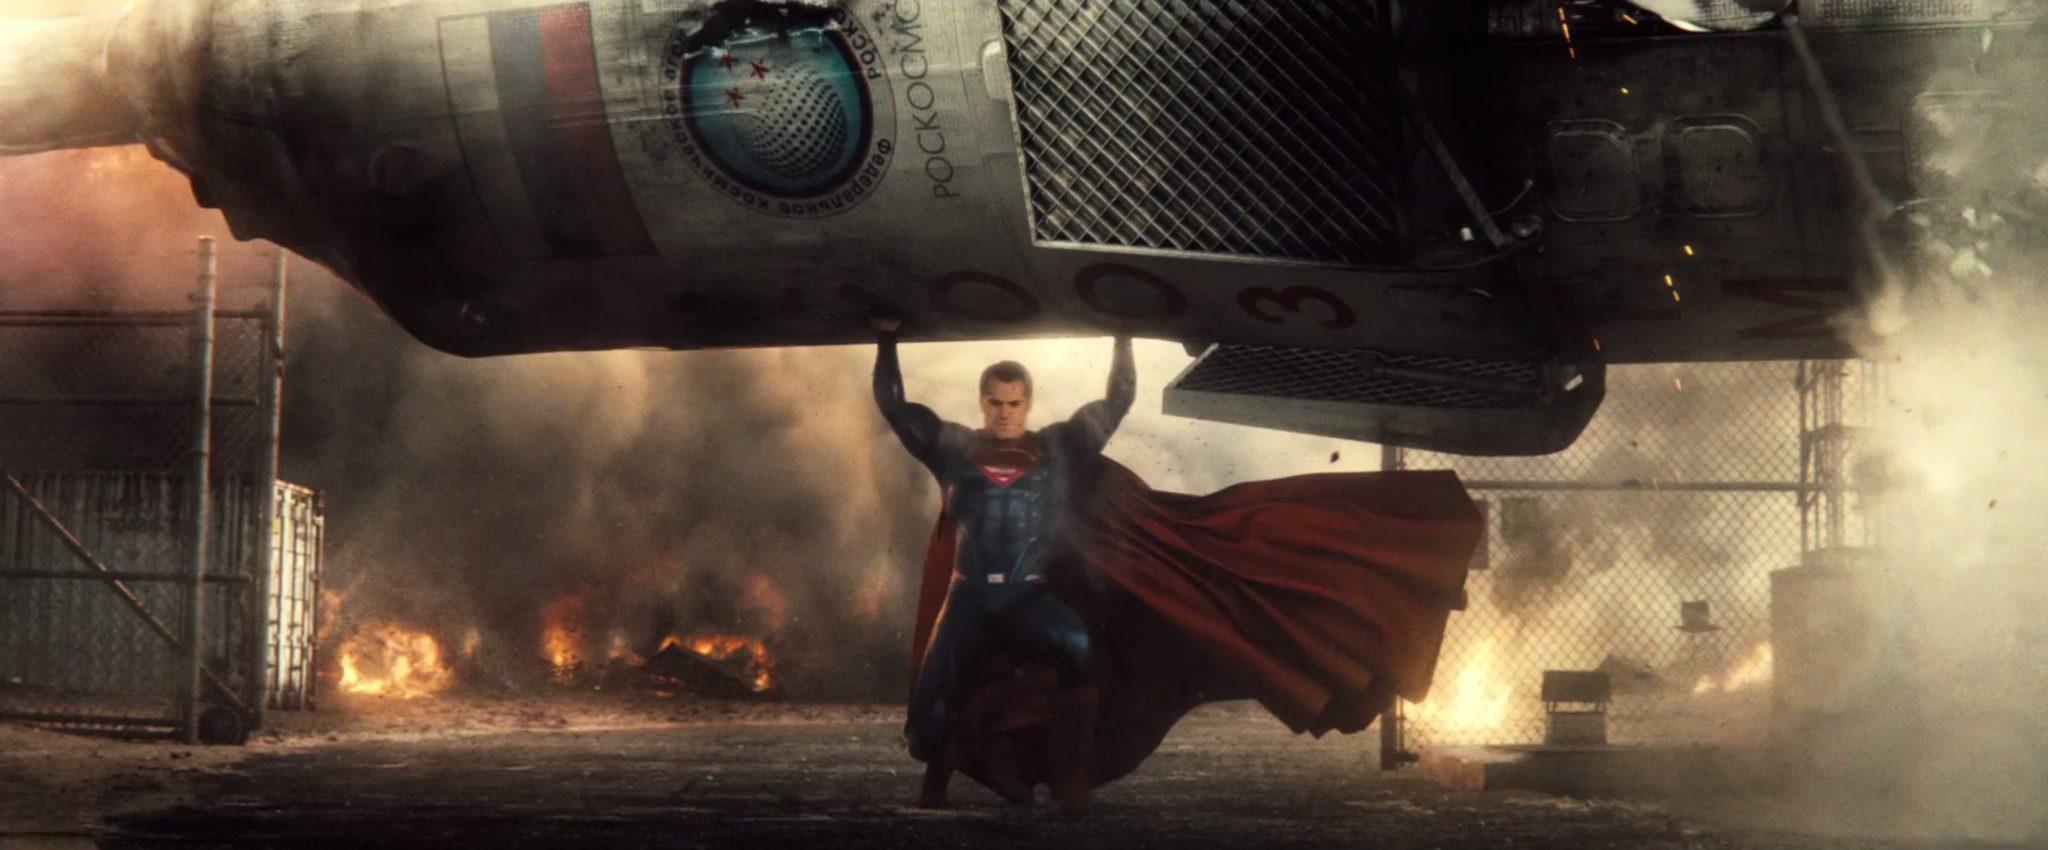 Batman v Superman- Dawn of Justice - IMAX trailer